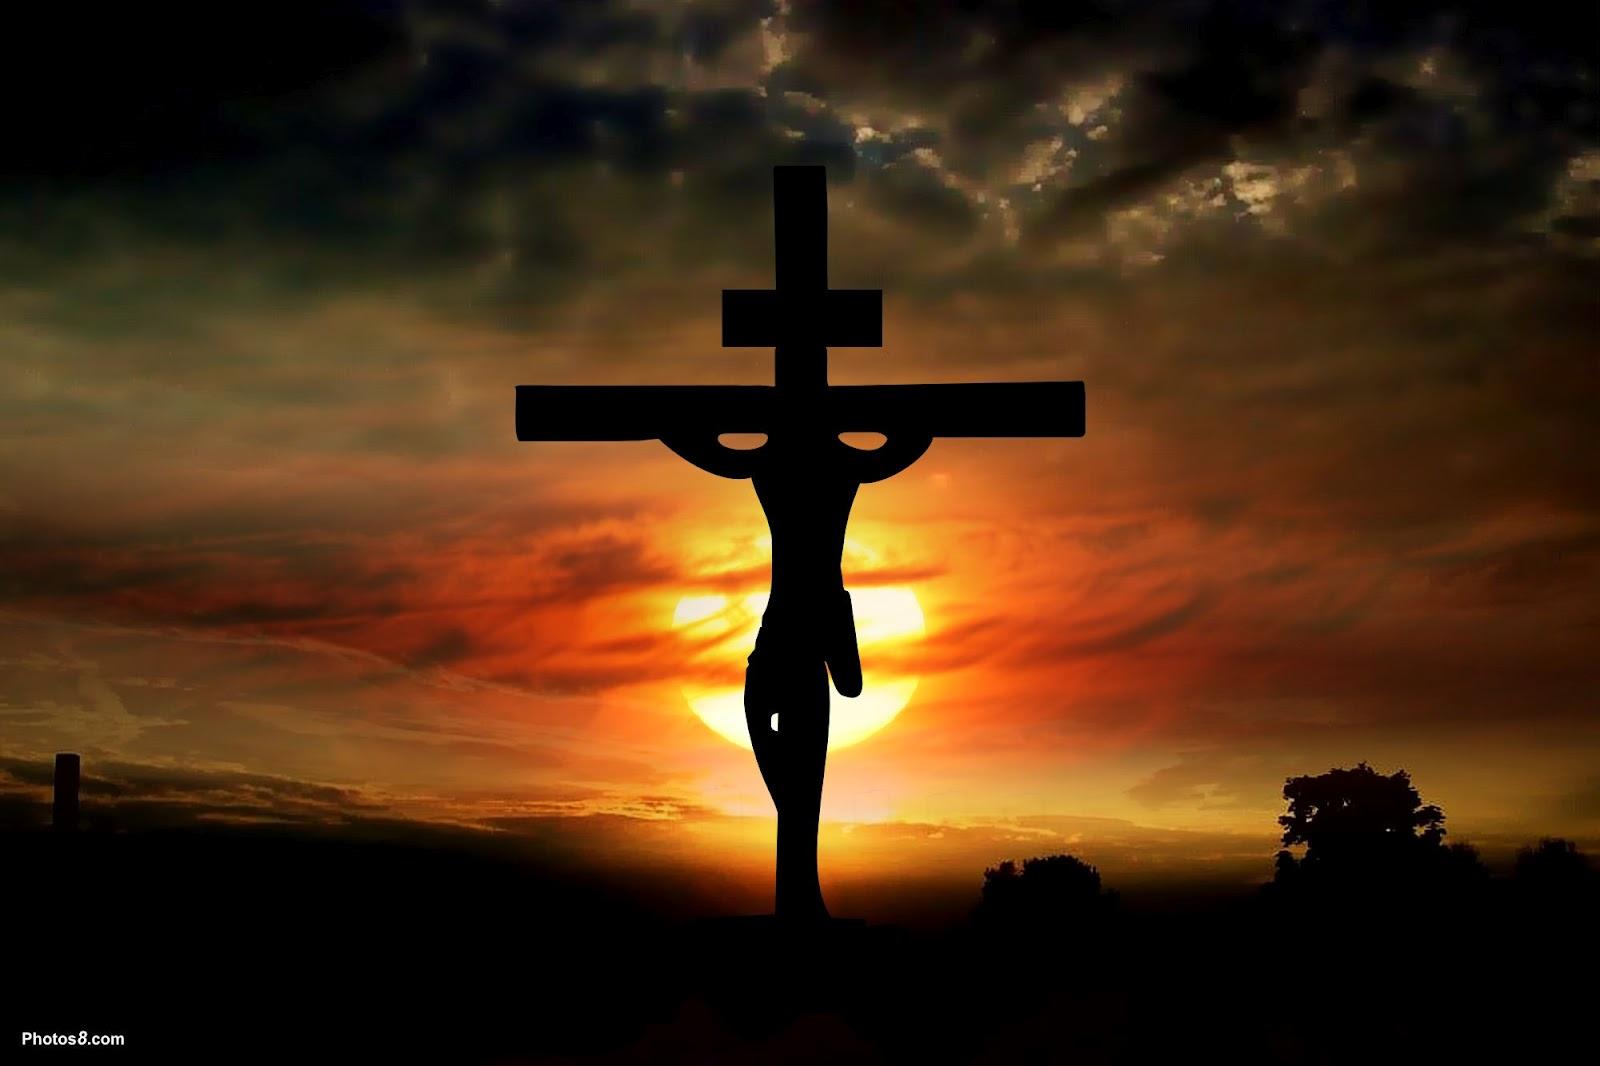 https://2.bp.blogspot.com/-tNOl3lcGJhQ/UFM7op7gtbI/AAAAAAAAAys/xcsQbSbote8/s1600/jesus-on-the-cross.jpg